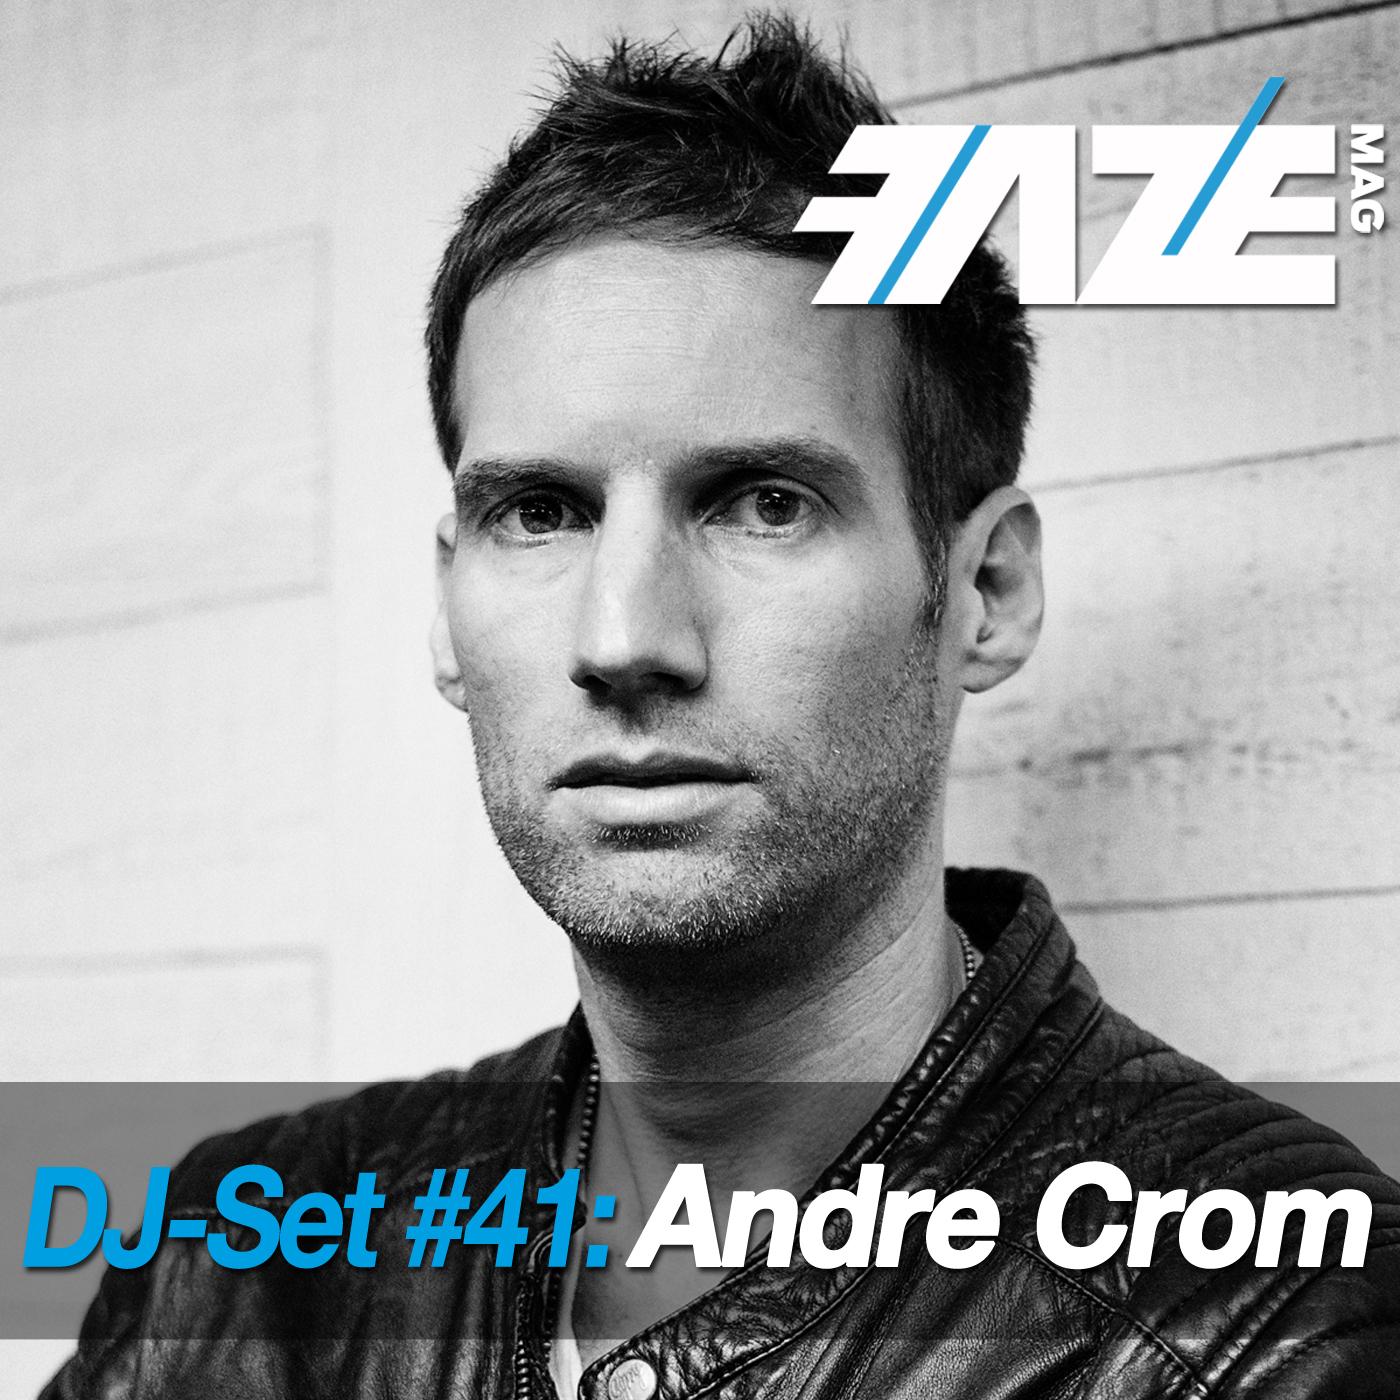 FAZEmag DJ-Set #41: Andre Crom – exklusiv bei iTunes